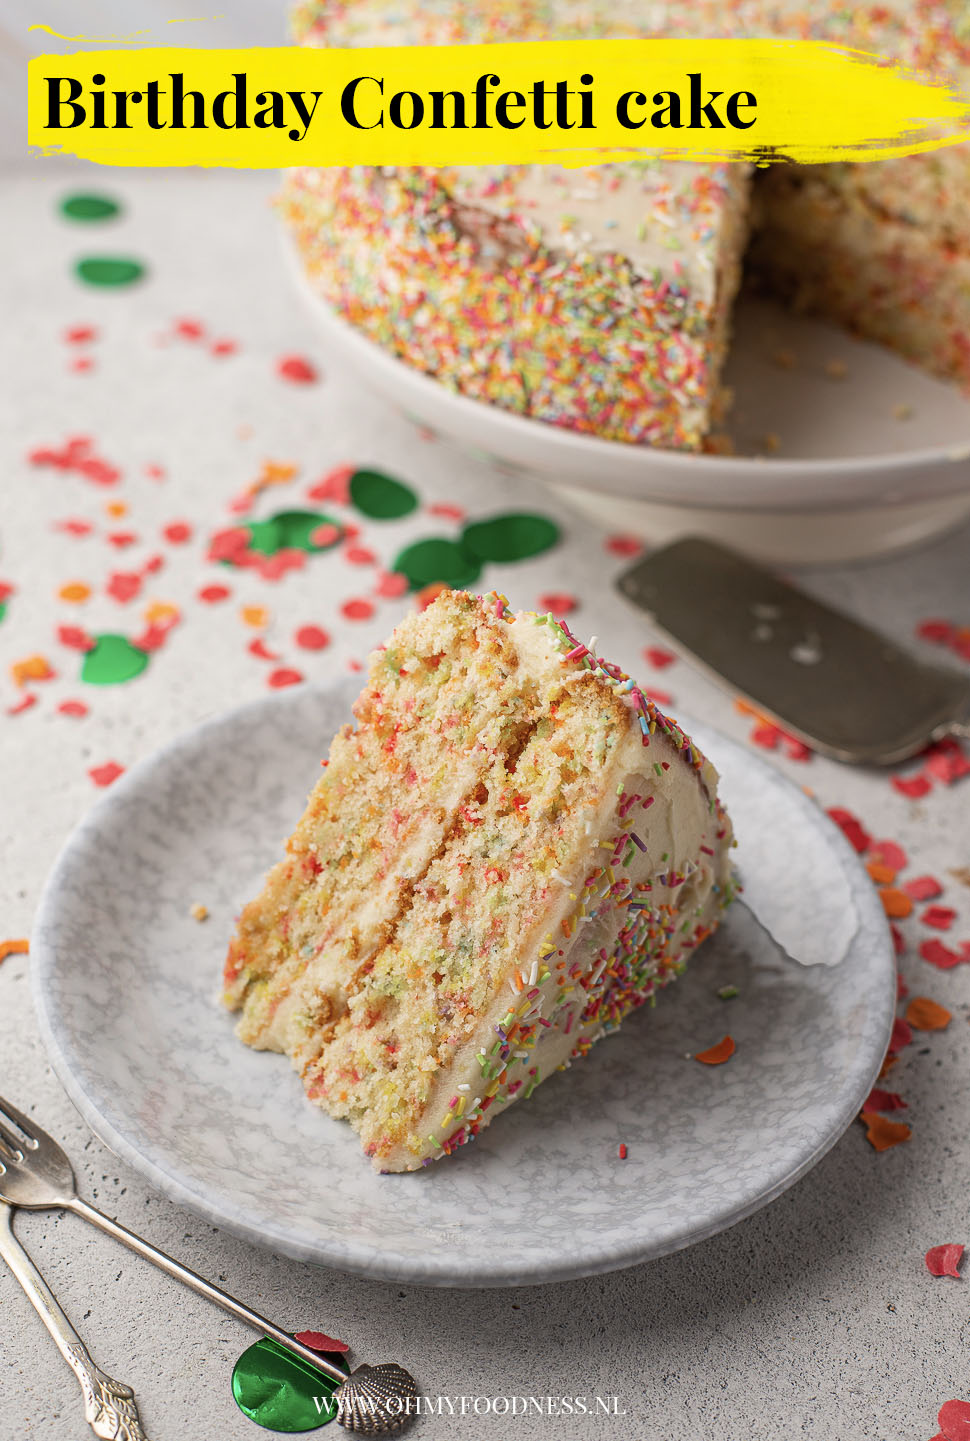 Birthday confetti cake